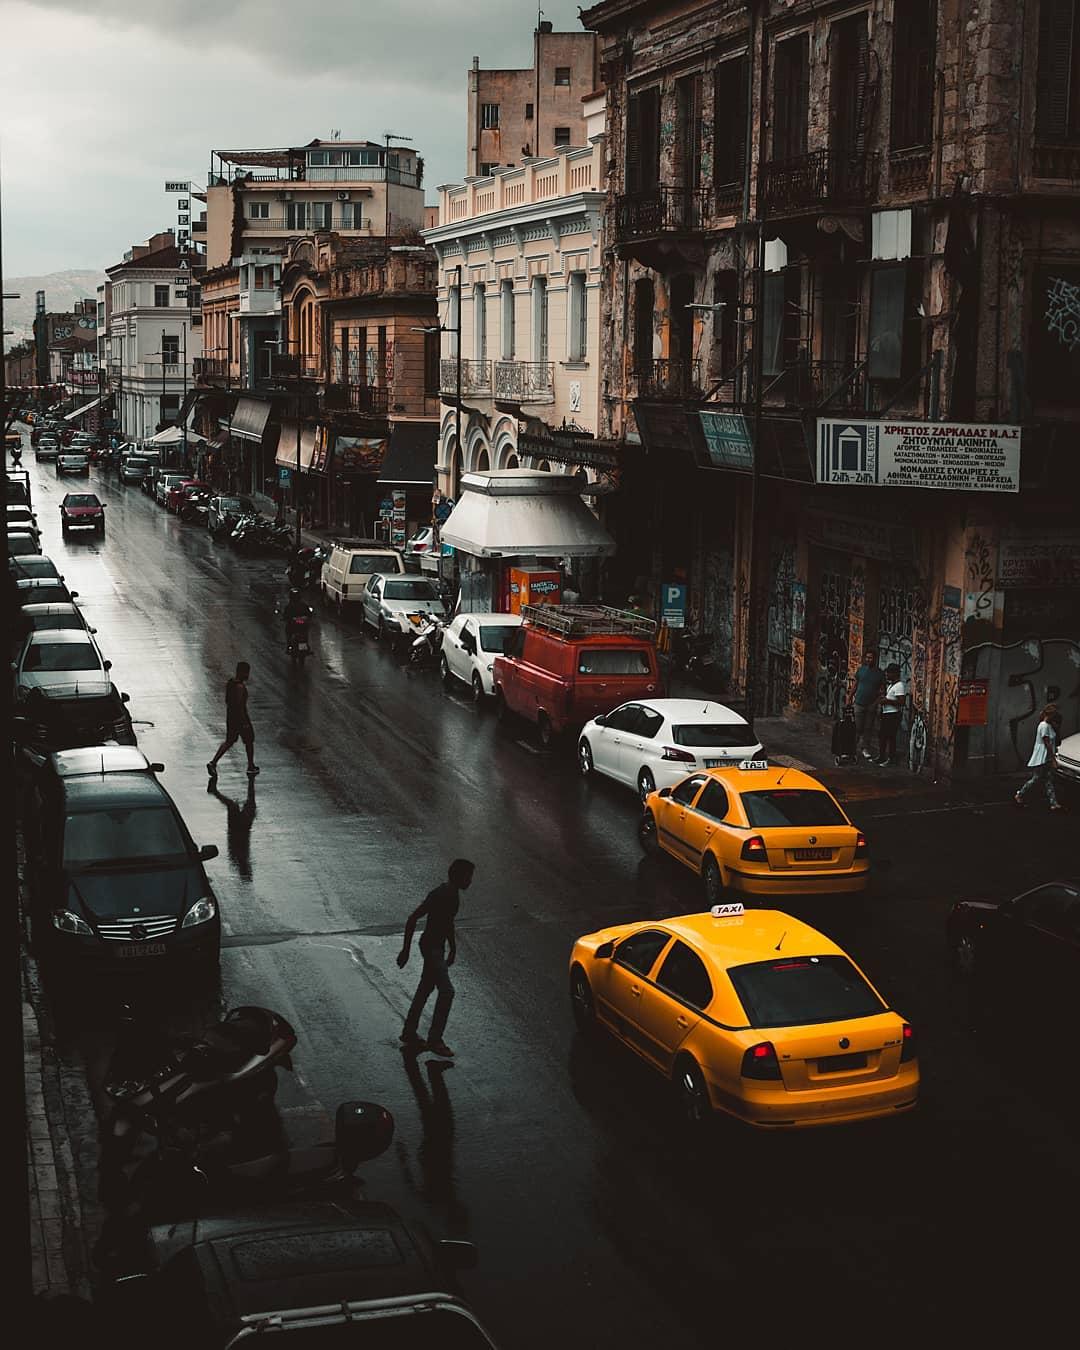 Городские и уличные снимки от Панагиотиса Коутрумписа